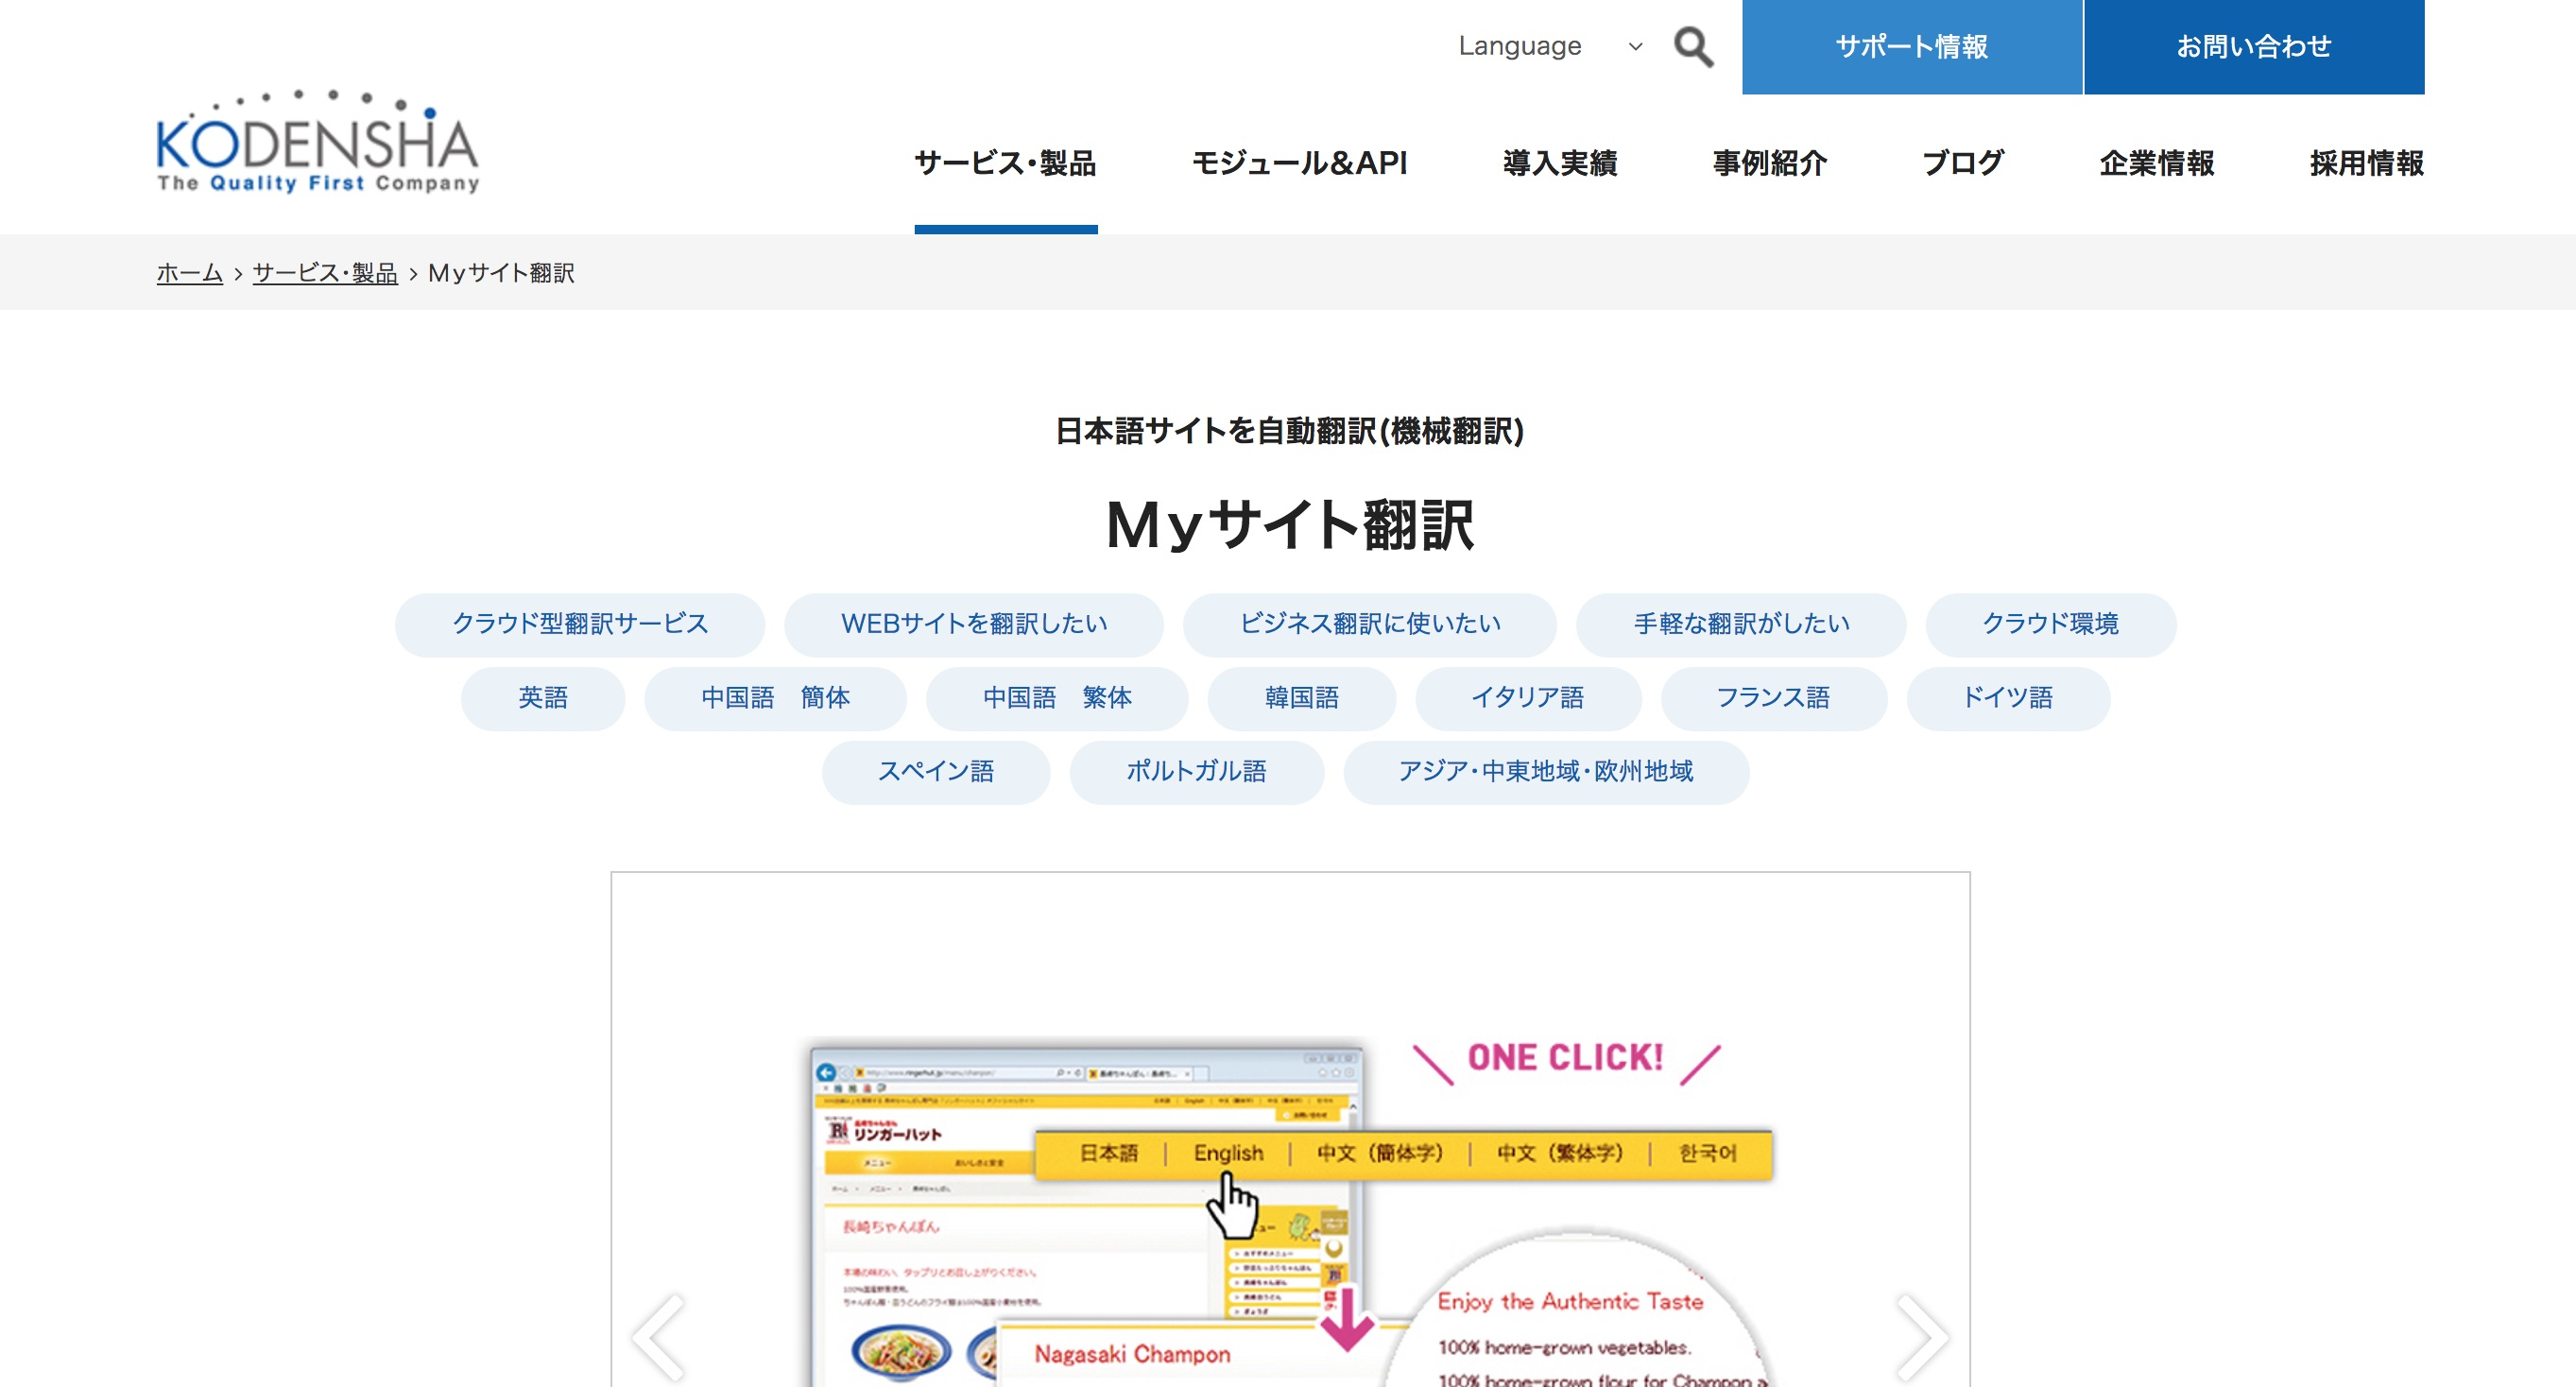 Myサイト翻訳のスクリーンショット